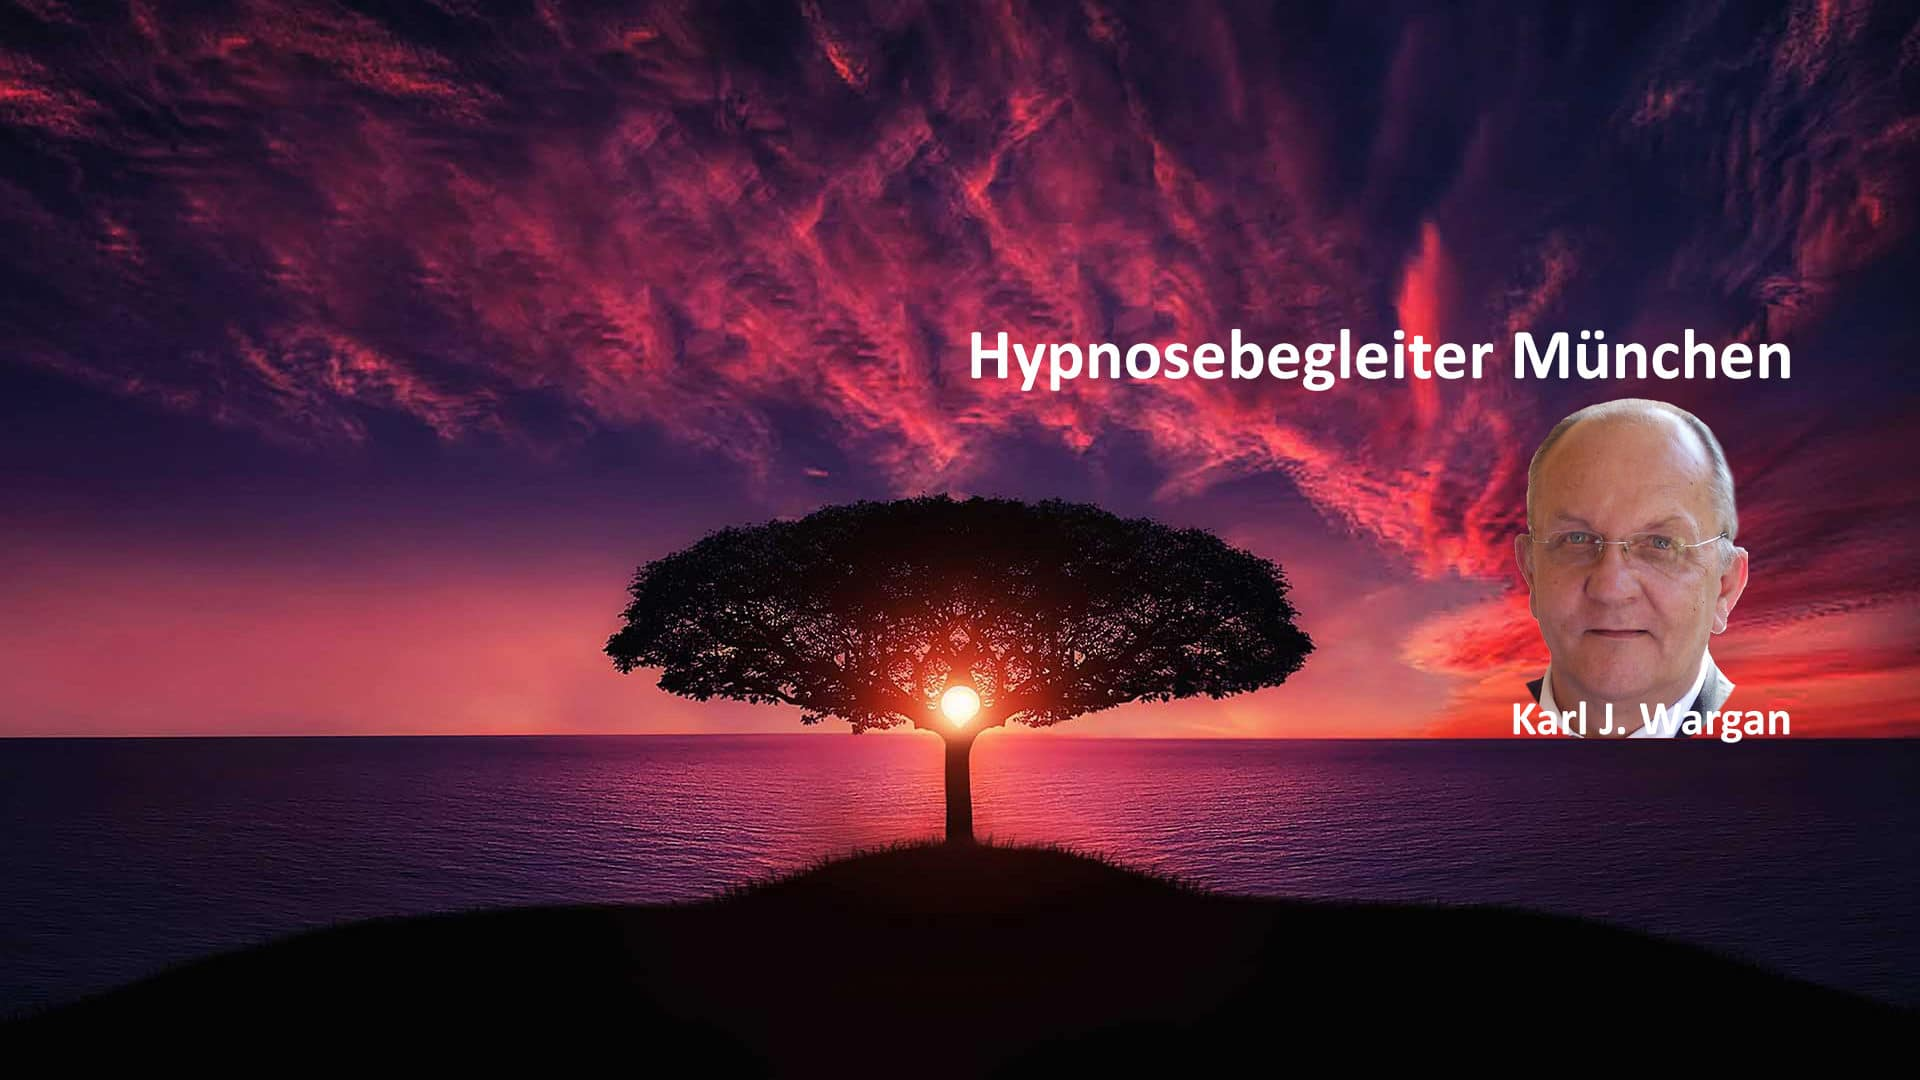 Hypnosebegleiter München Hypnose Selbsthypnose